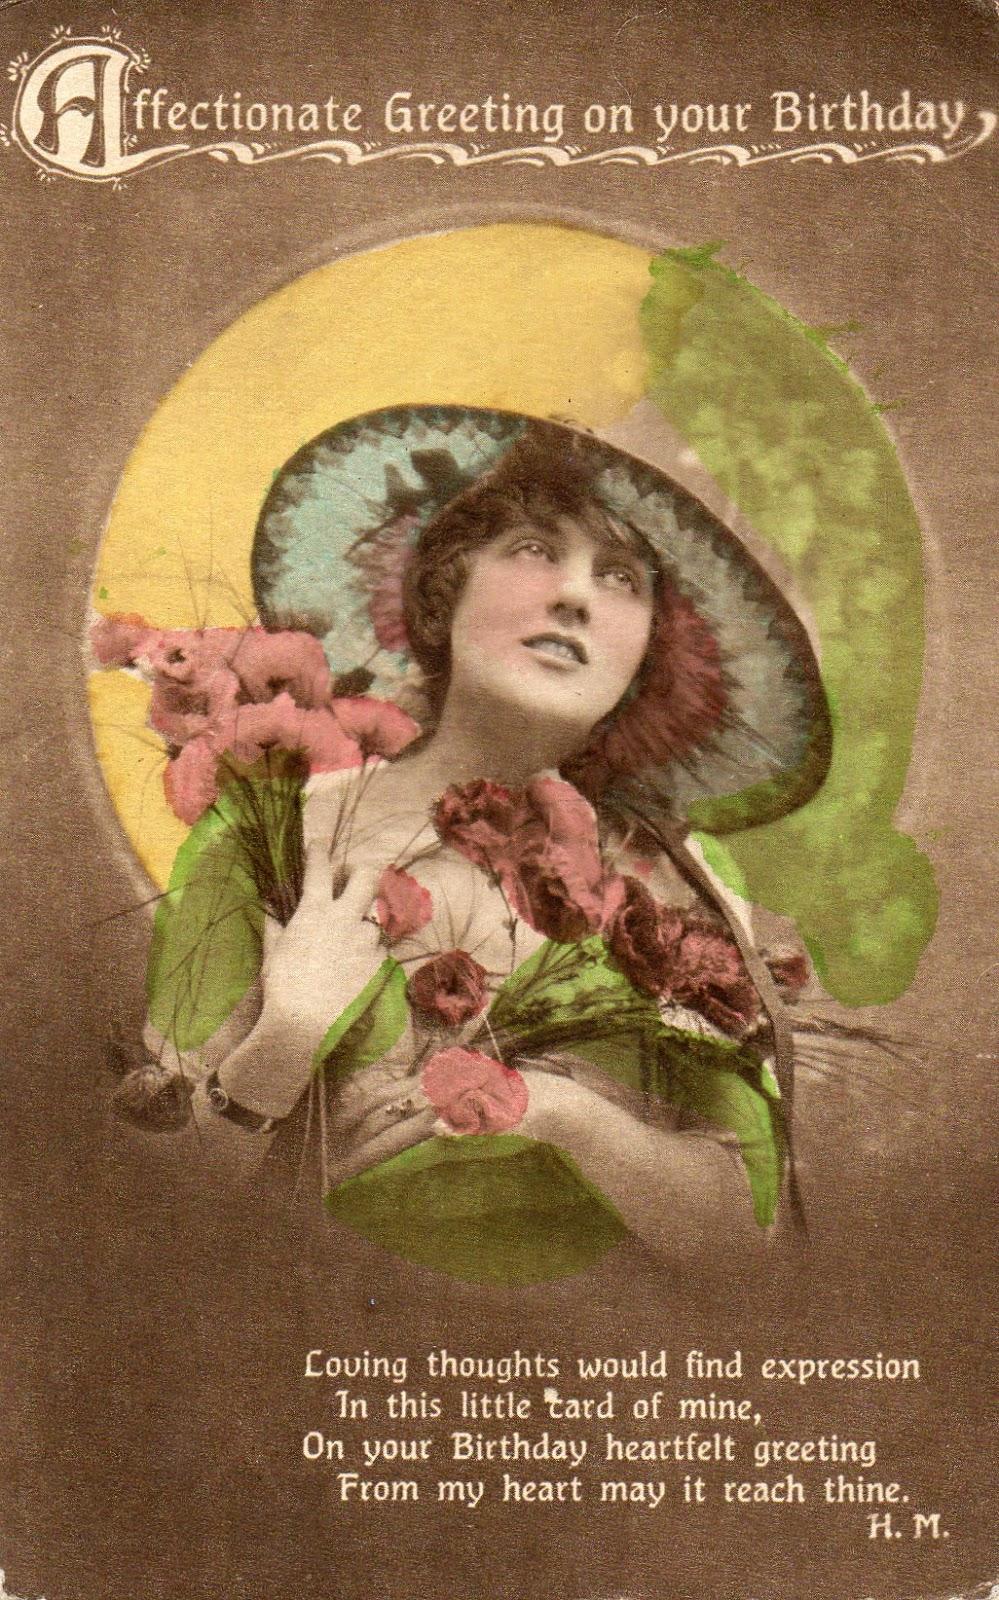 GREETINGS POSTCARD OF EDWARDIAN LADY WEARING A HAT